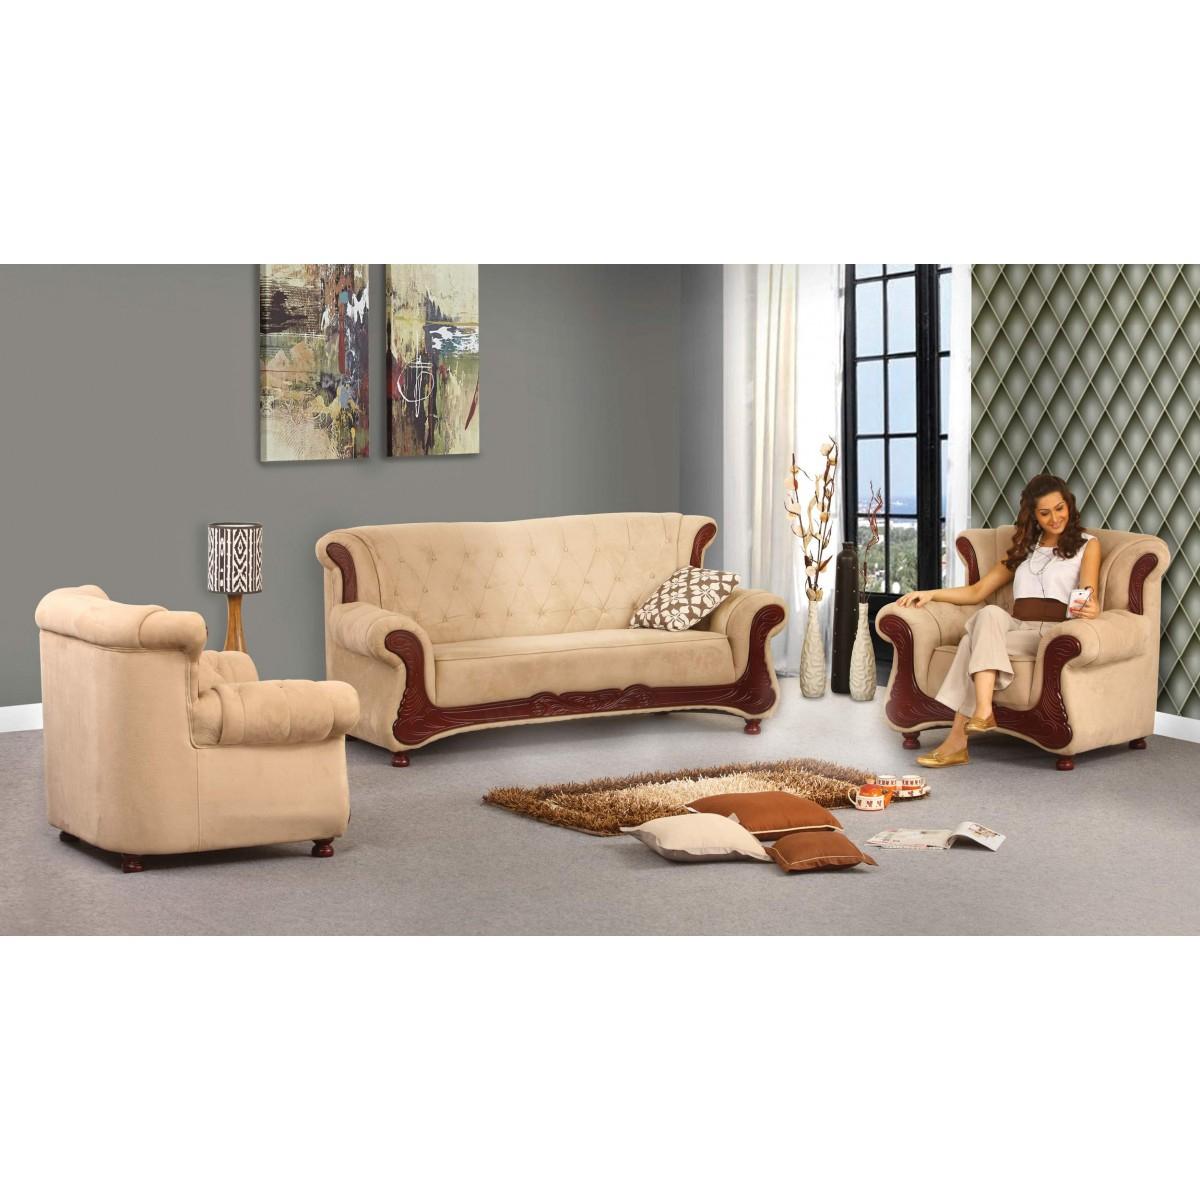 Grace Sofa | Damro Pertaining To Grace Sofa Chairs (Photo 2 of 20)